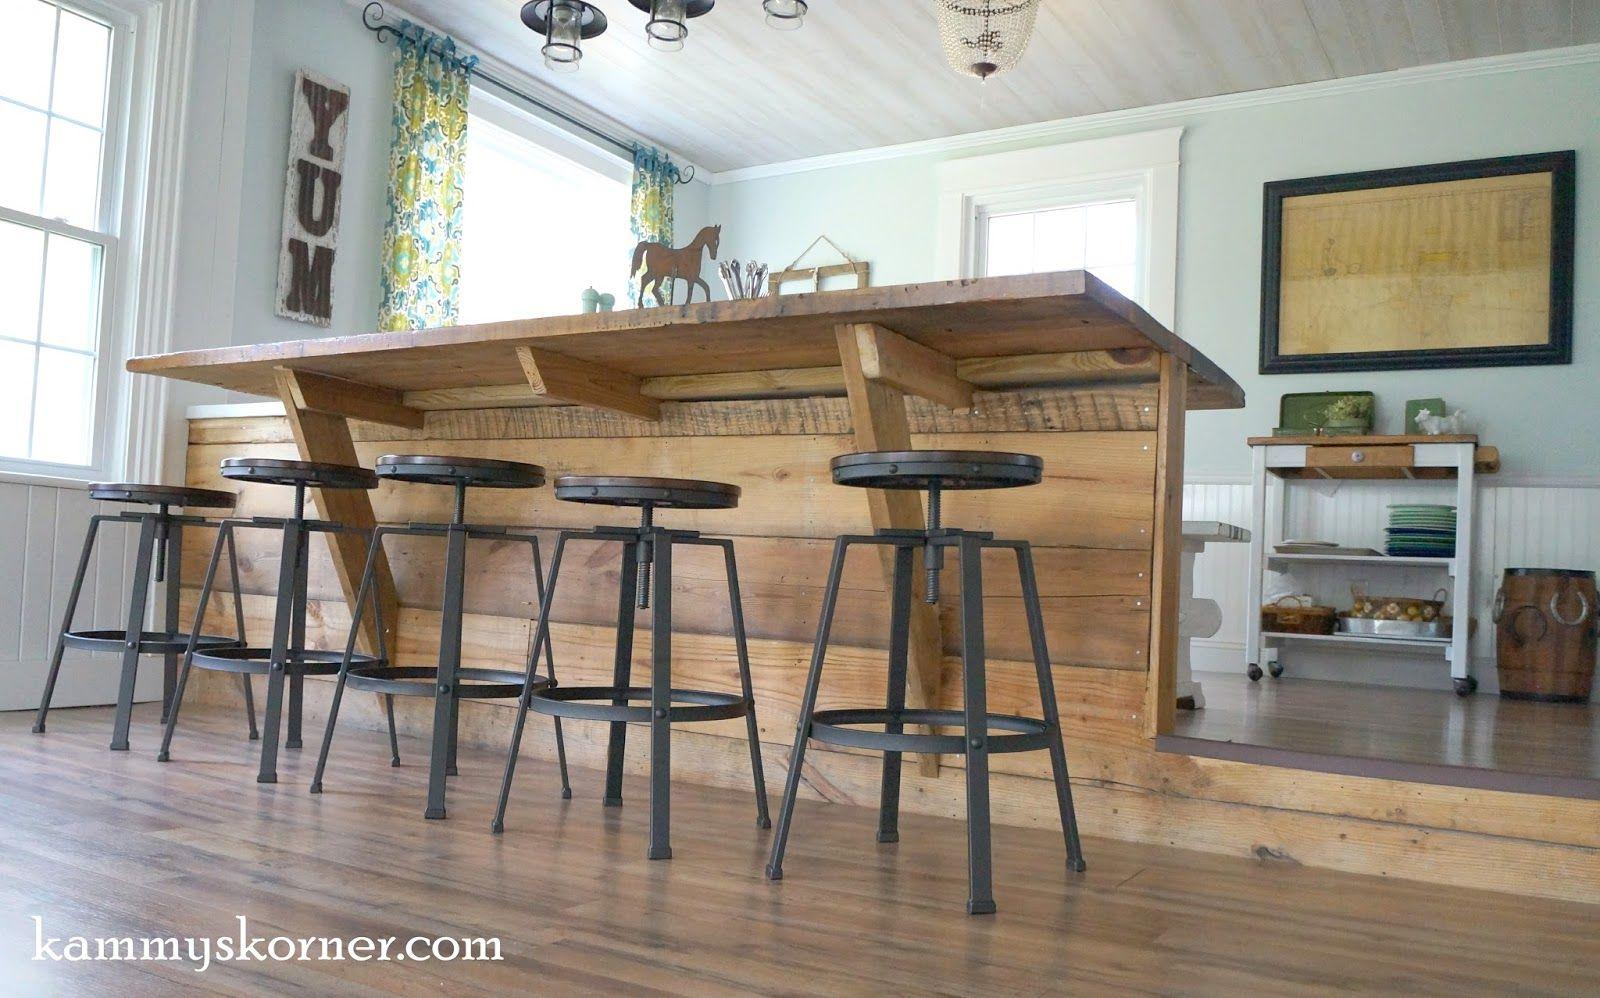 20 Step Down Sunroom Built In Breakfast Bar Made Of Reclaimed